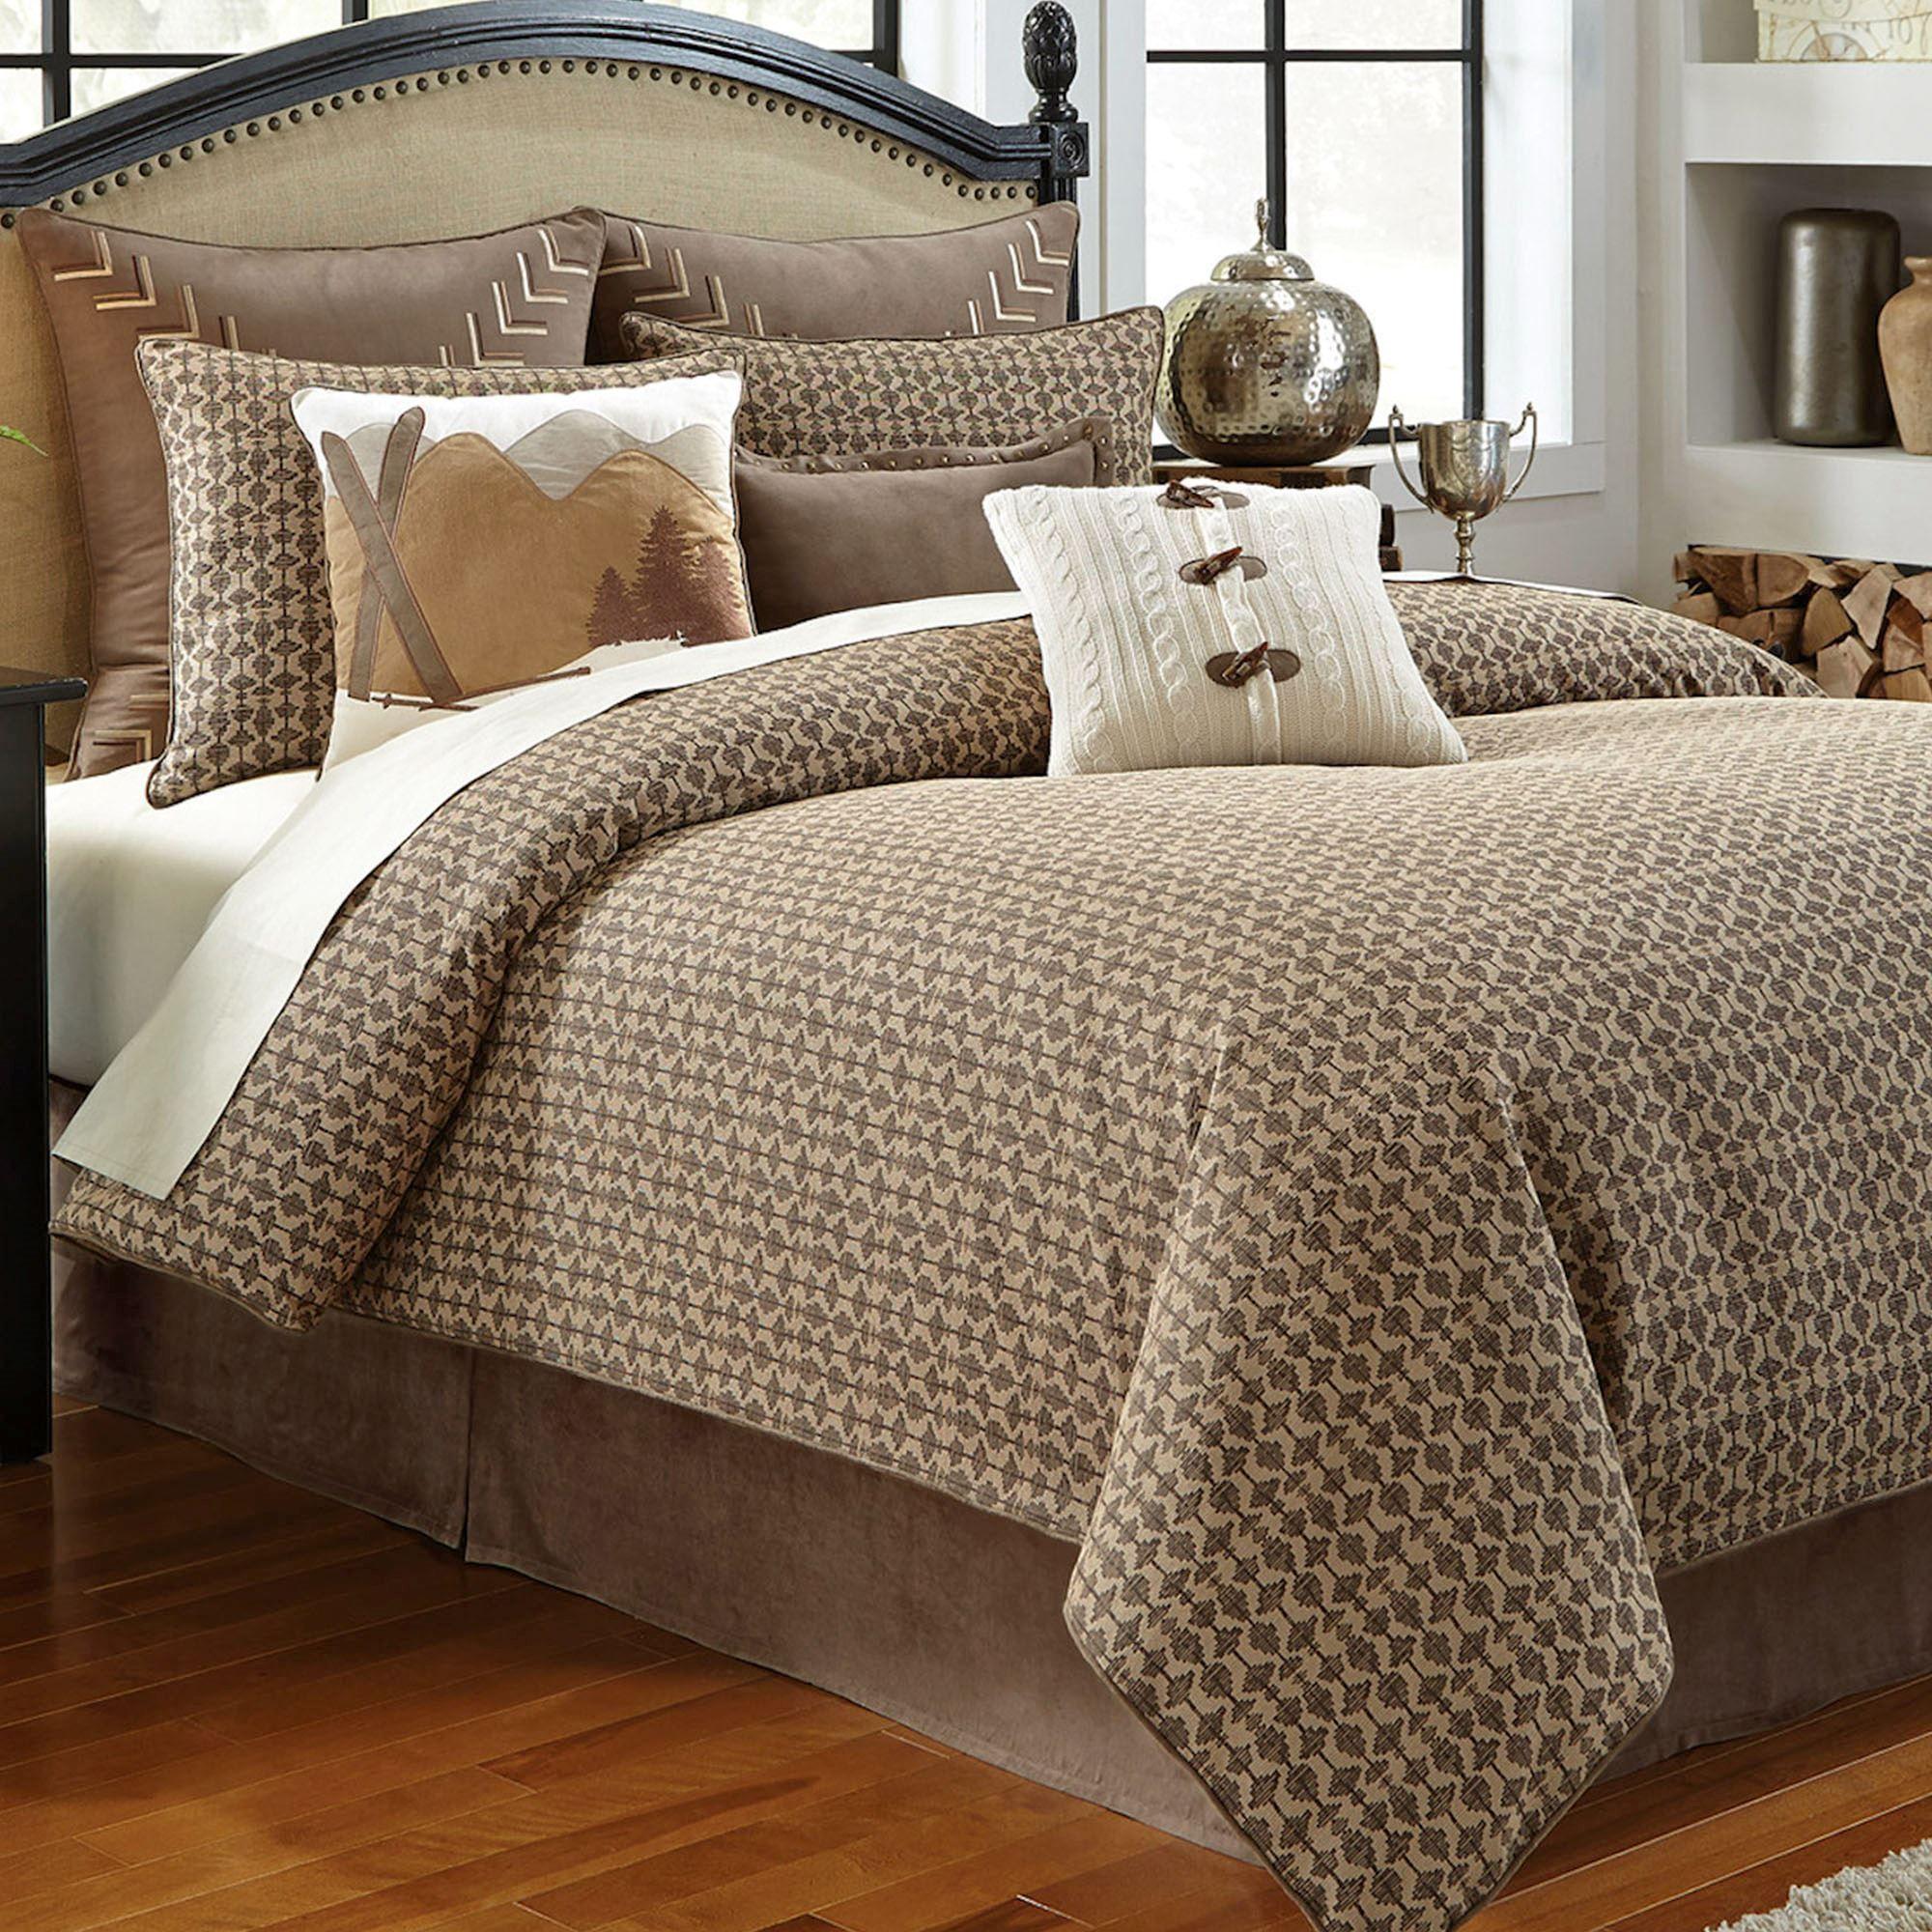 Aspen comforter set tan grey comforter sets linen